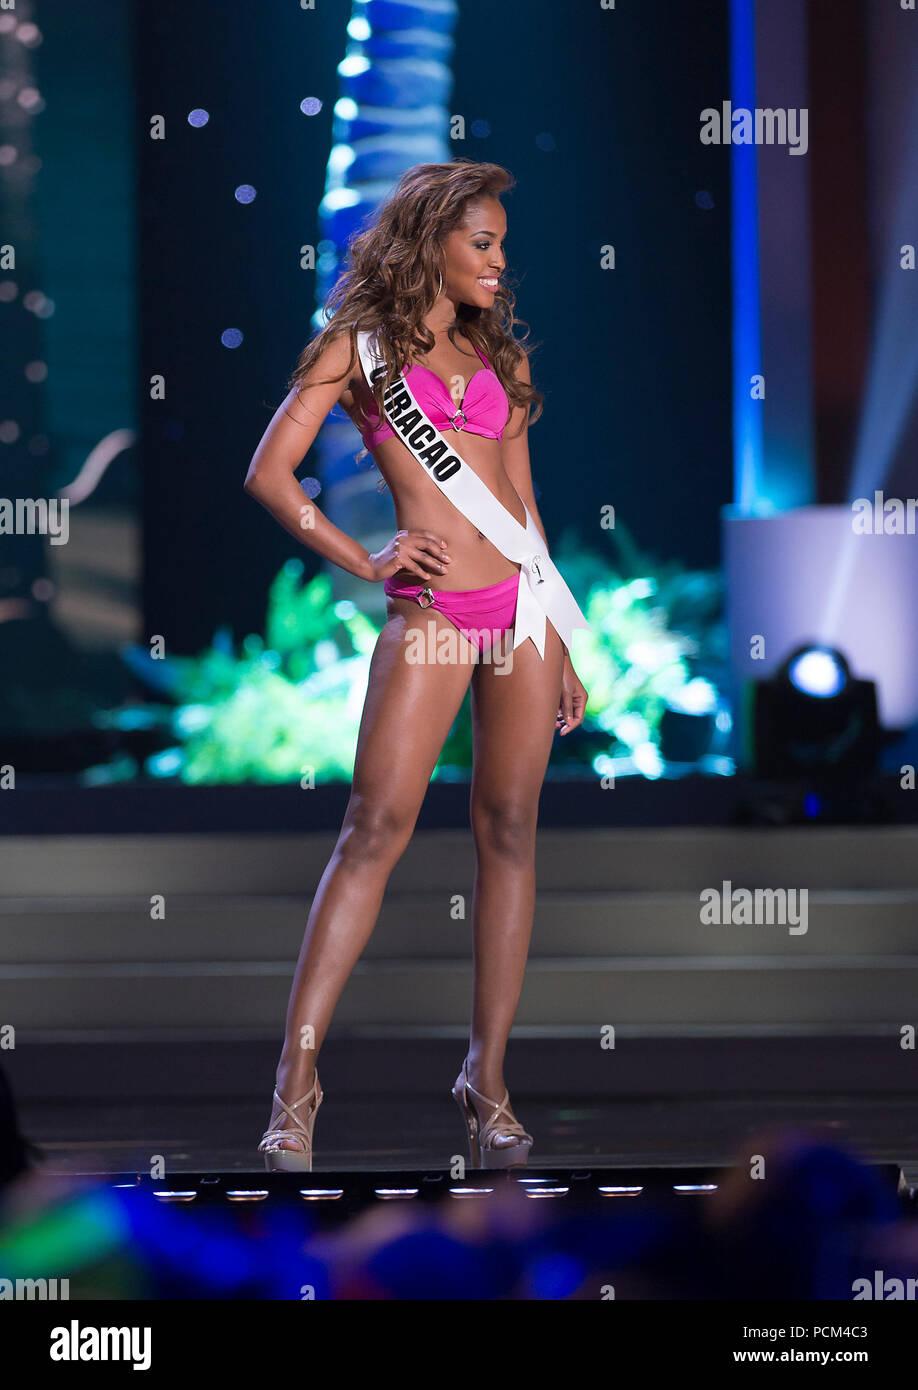 DORAL, FL - JANUARY 21: Miss Curacao Laurien Angelista 2014